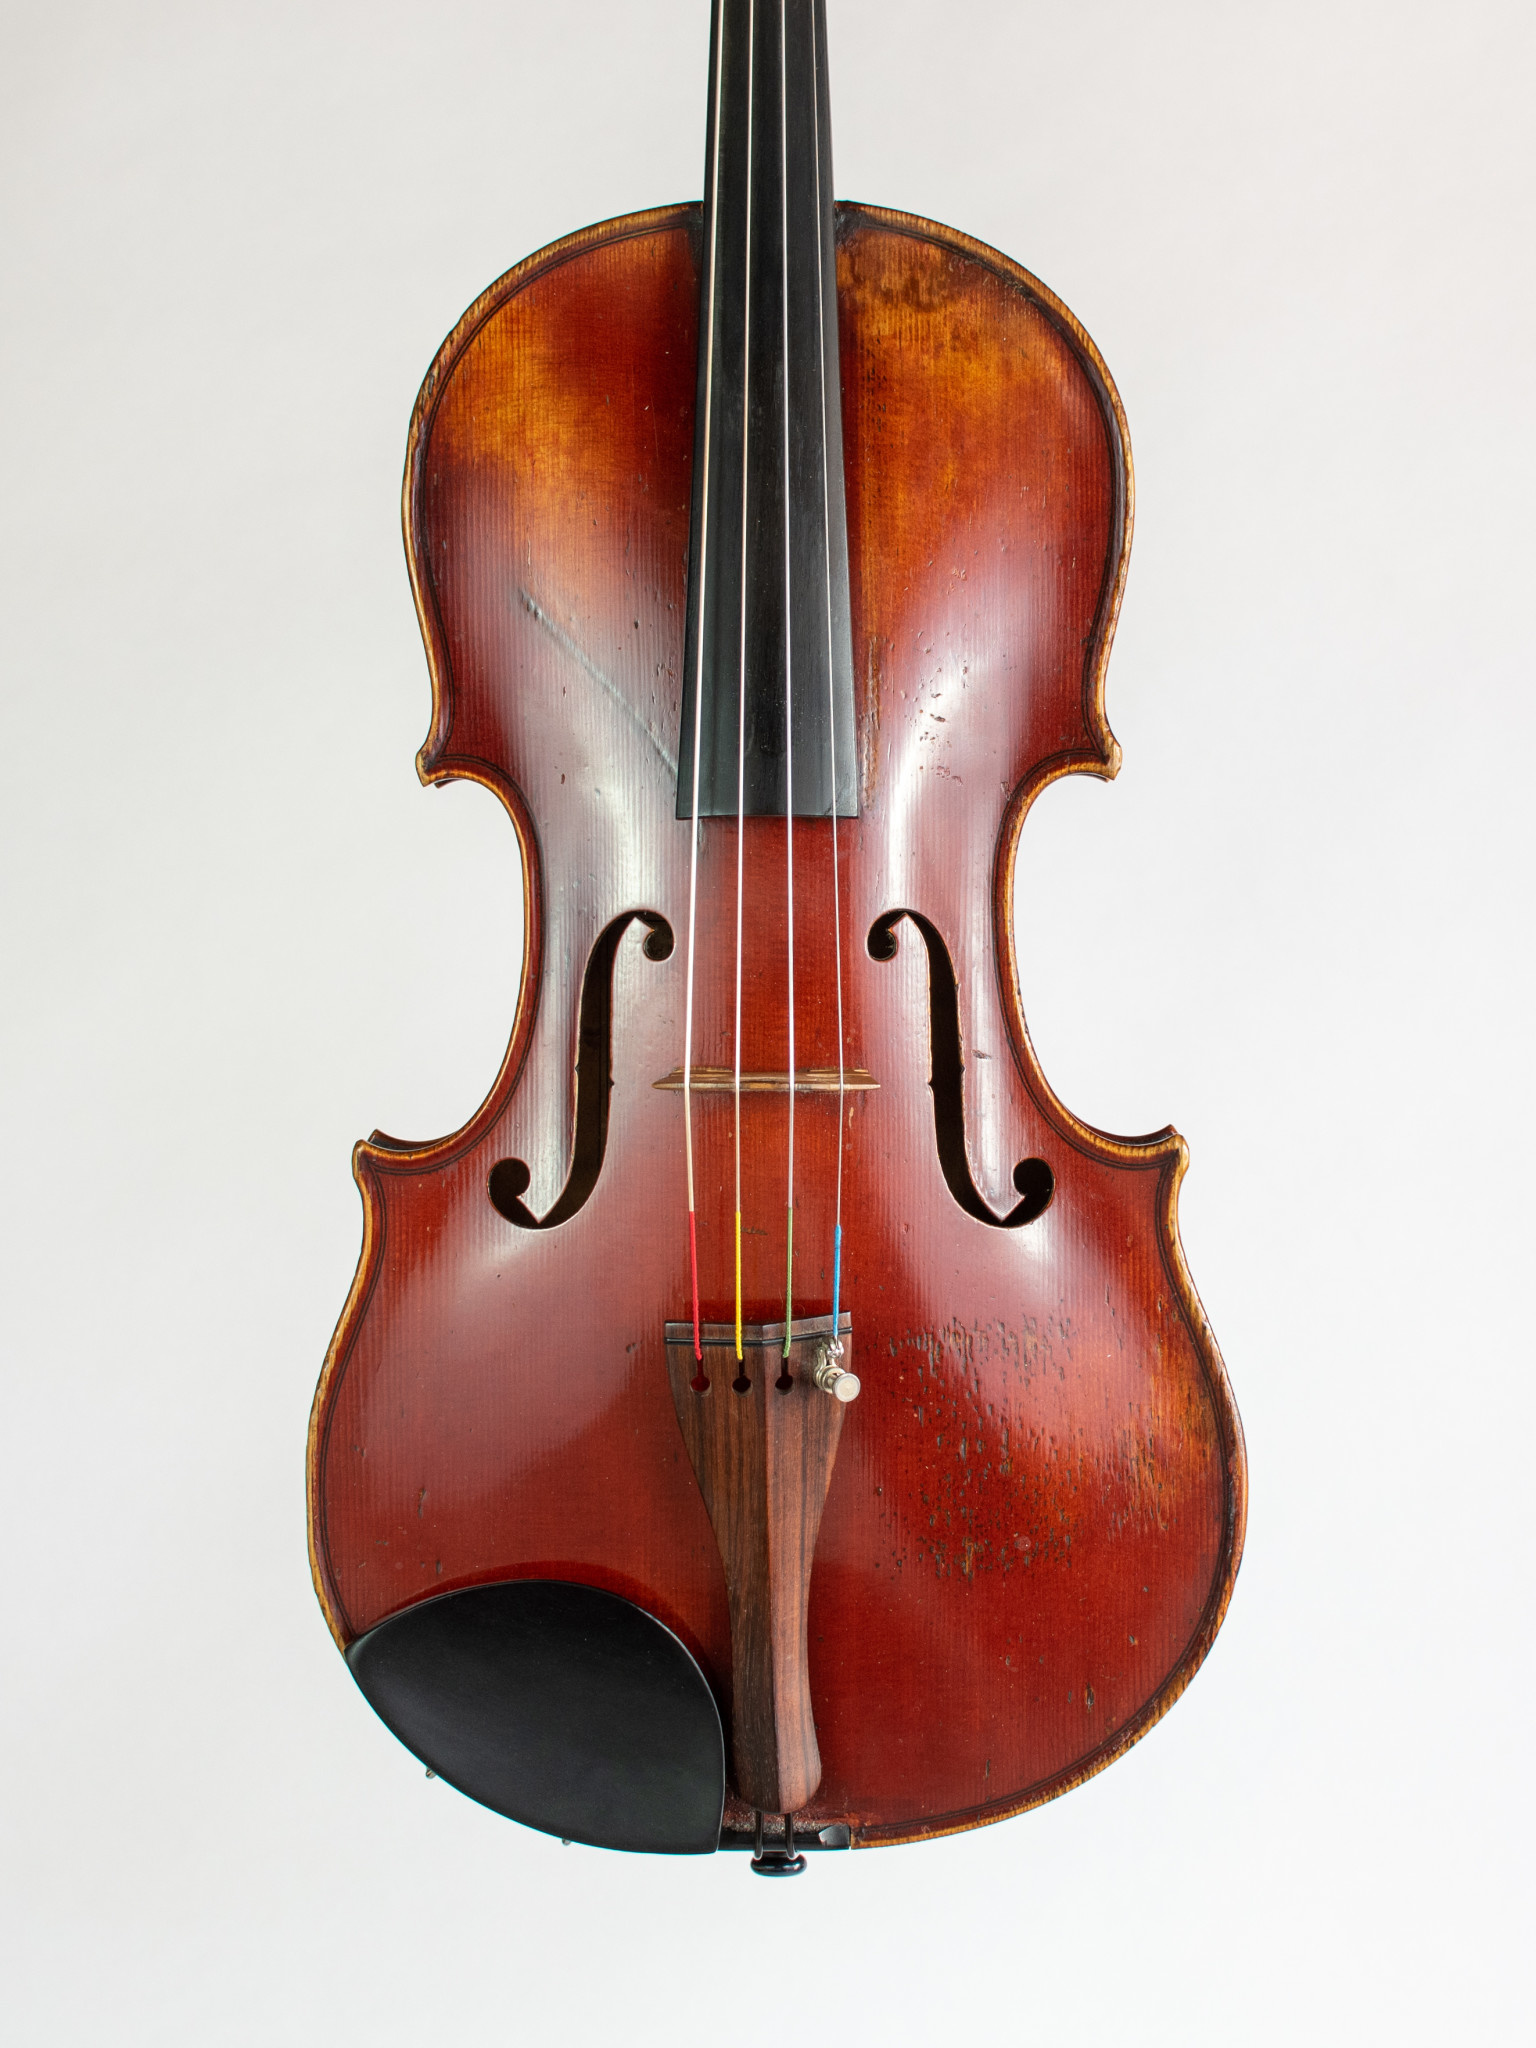 French Gand & Bernardel 16 1/4 viola, 1889, Paris, FRANCE